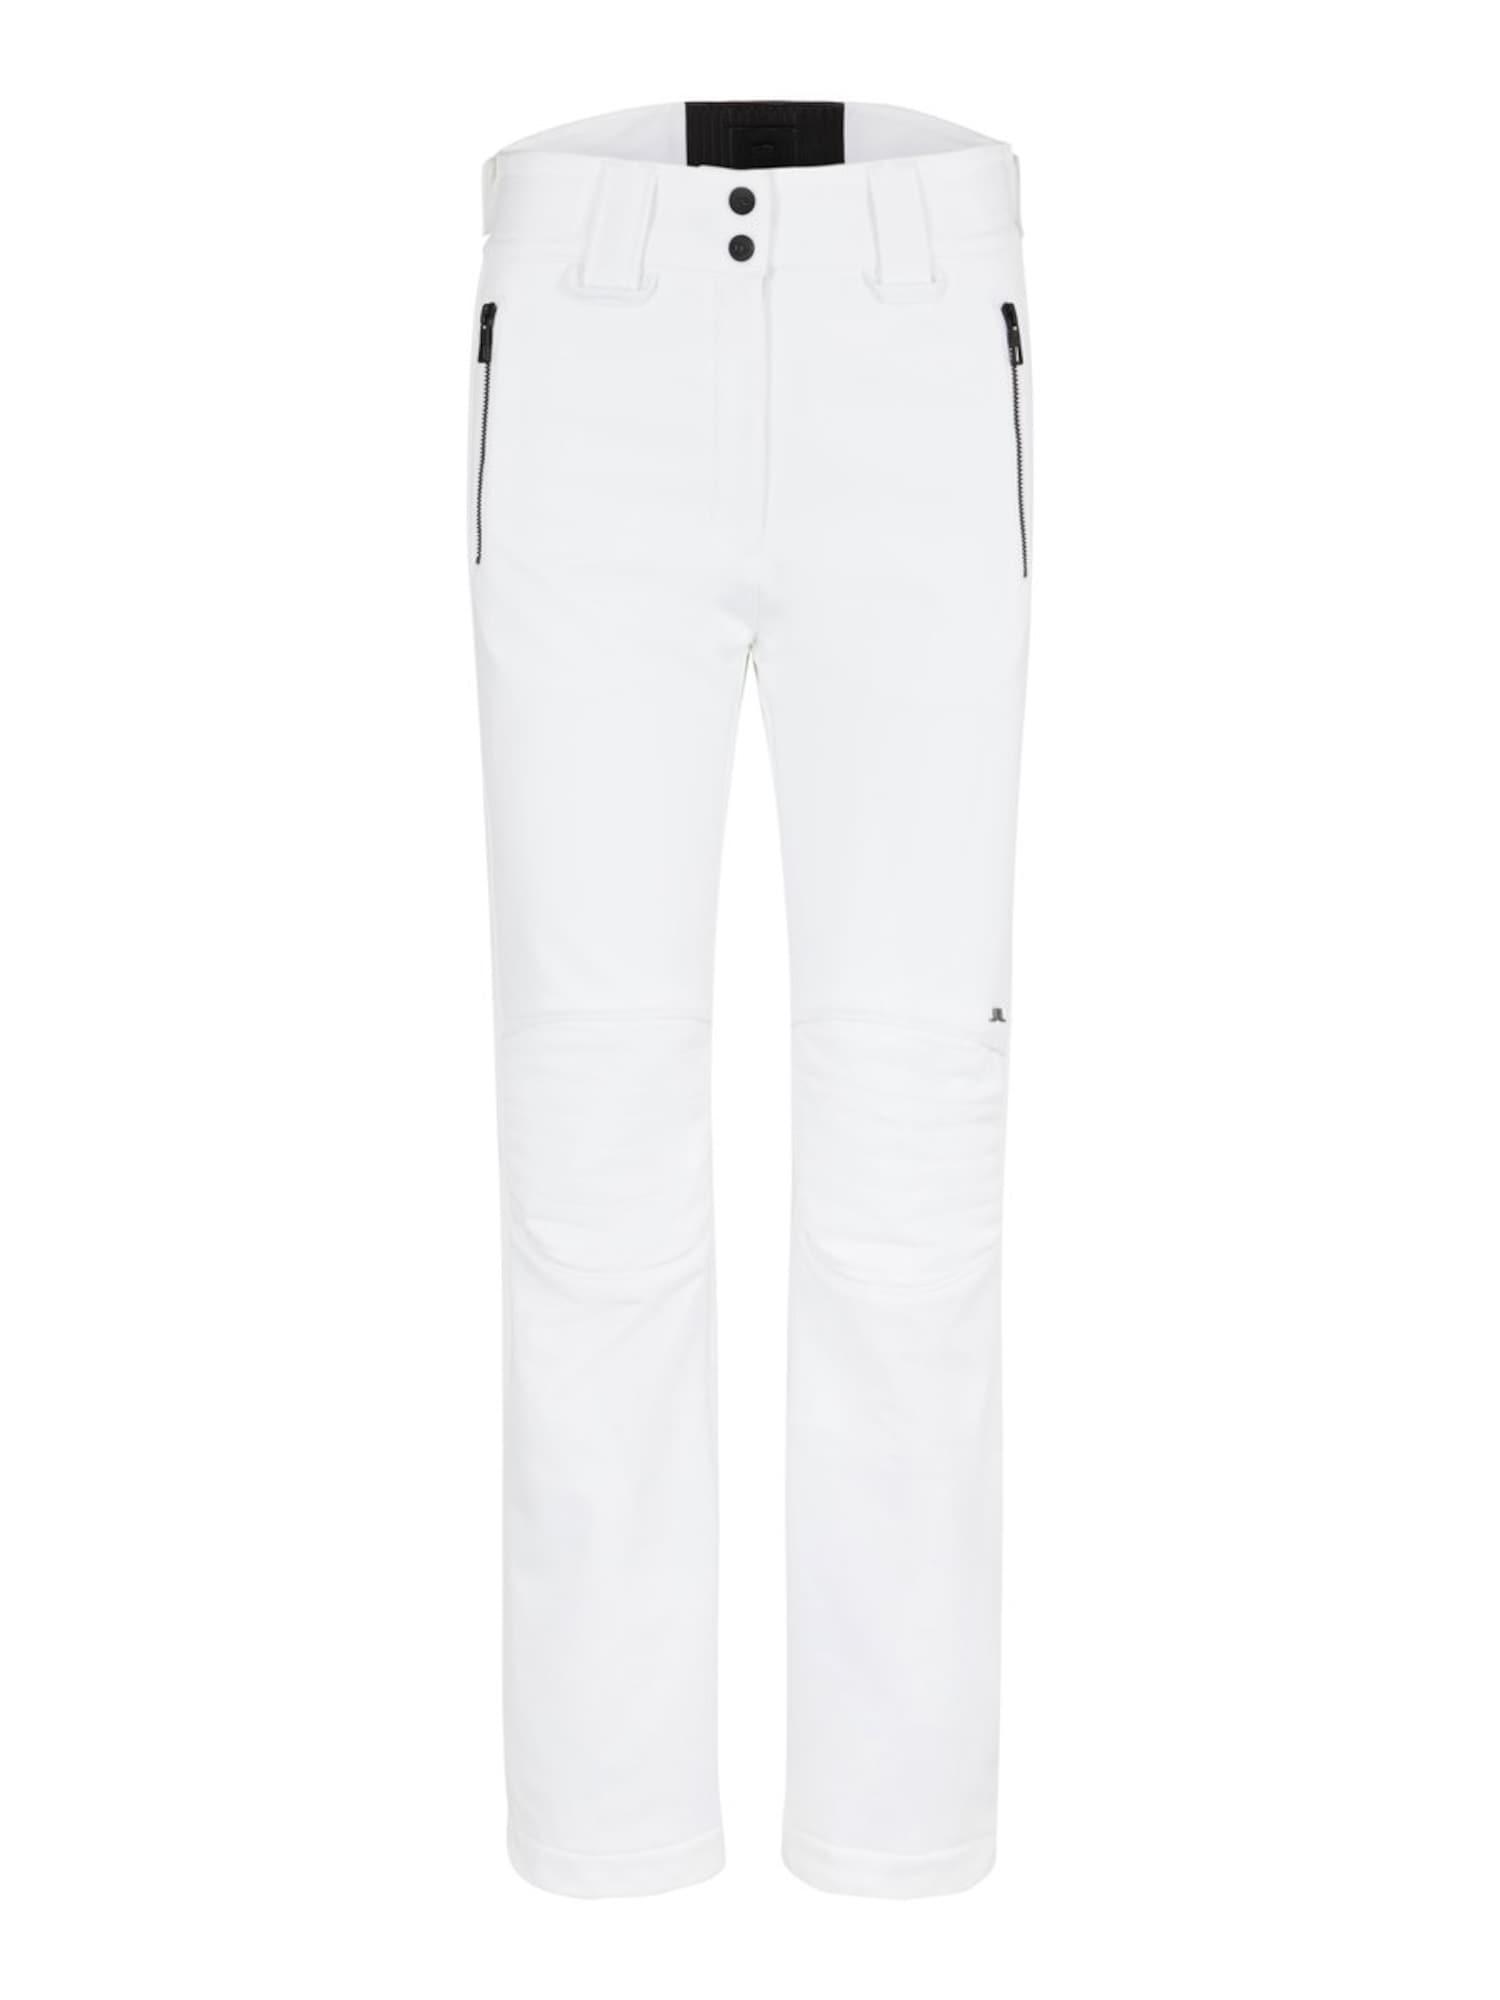 Skihose | Sportbekleidung > Sporthosen > Skihosen | Weiß | J.Lindeberg